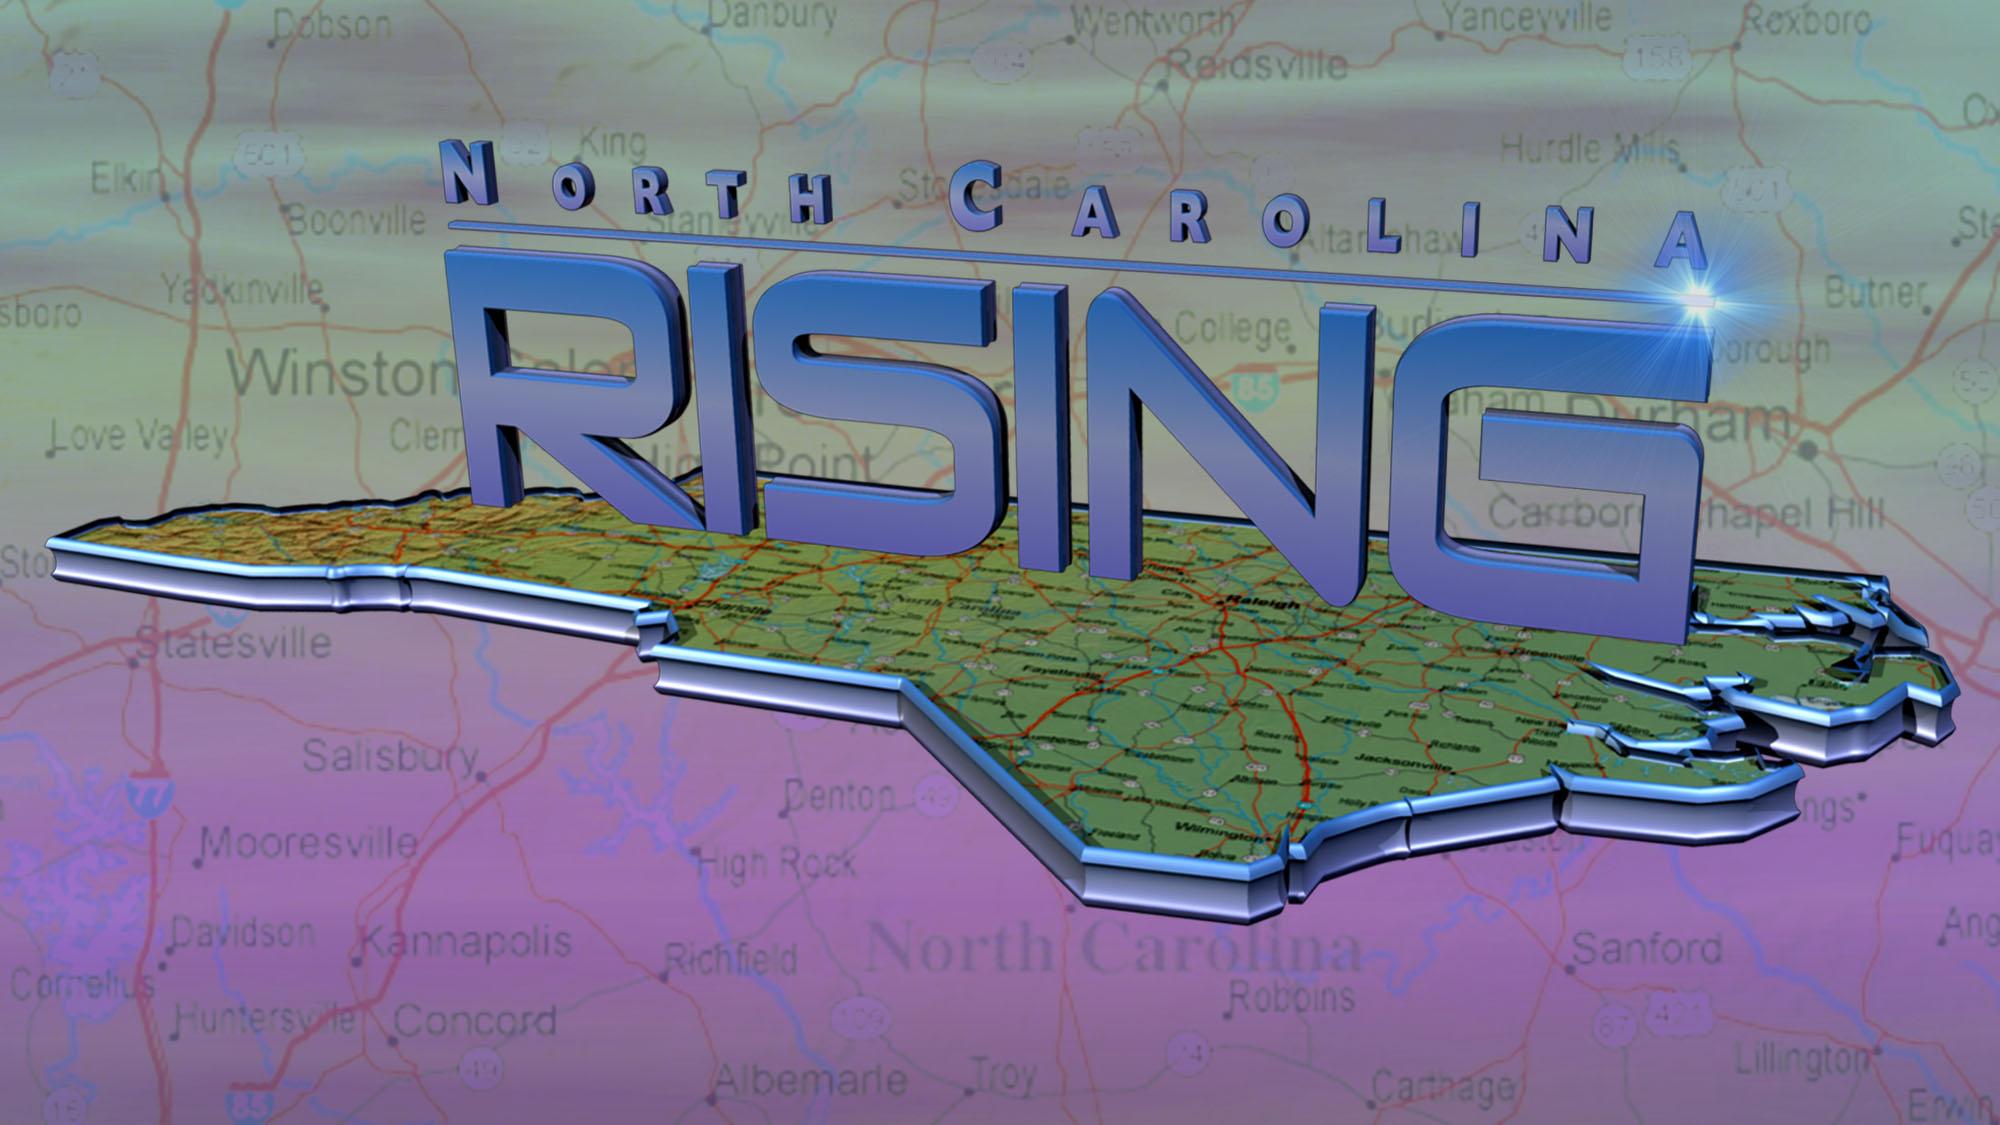 North Carolina Rising logo